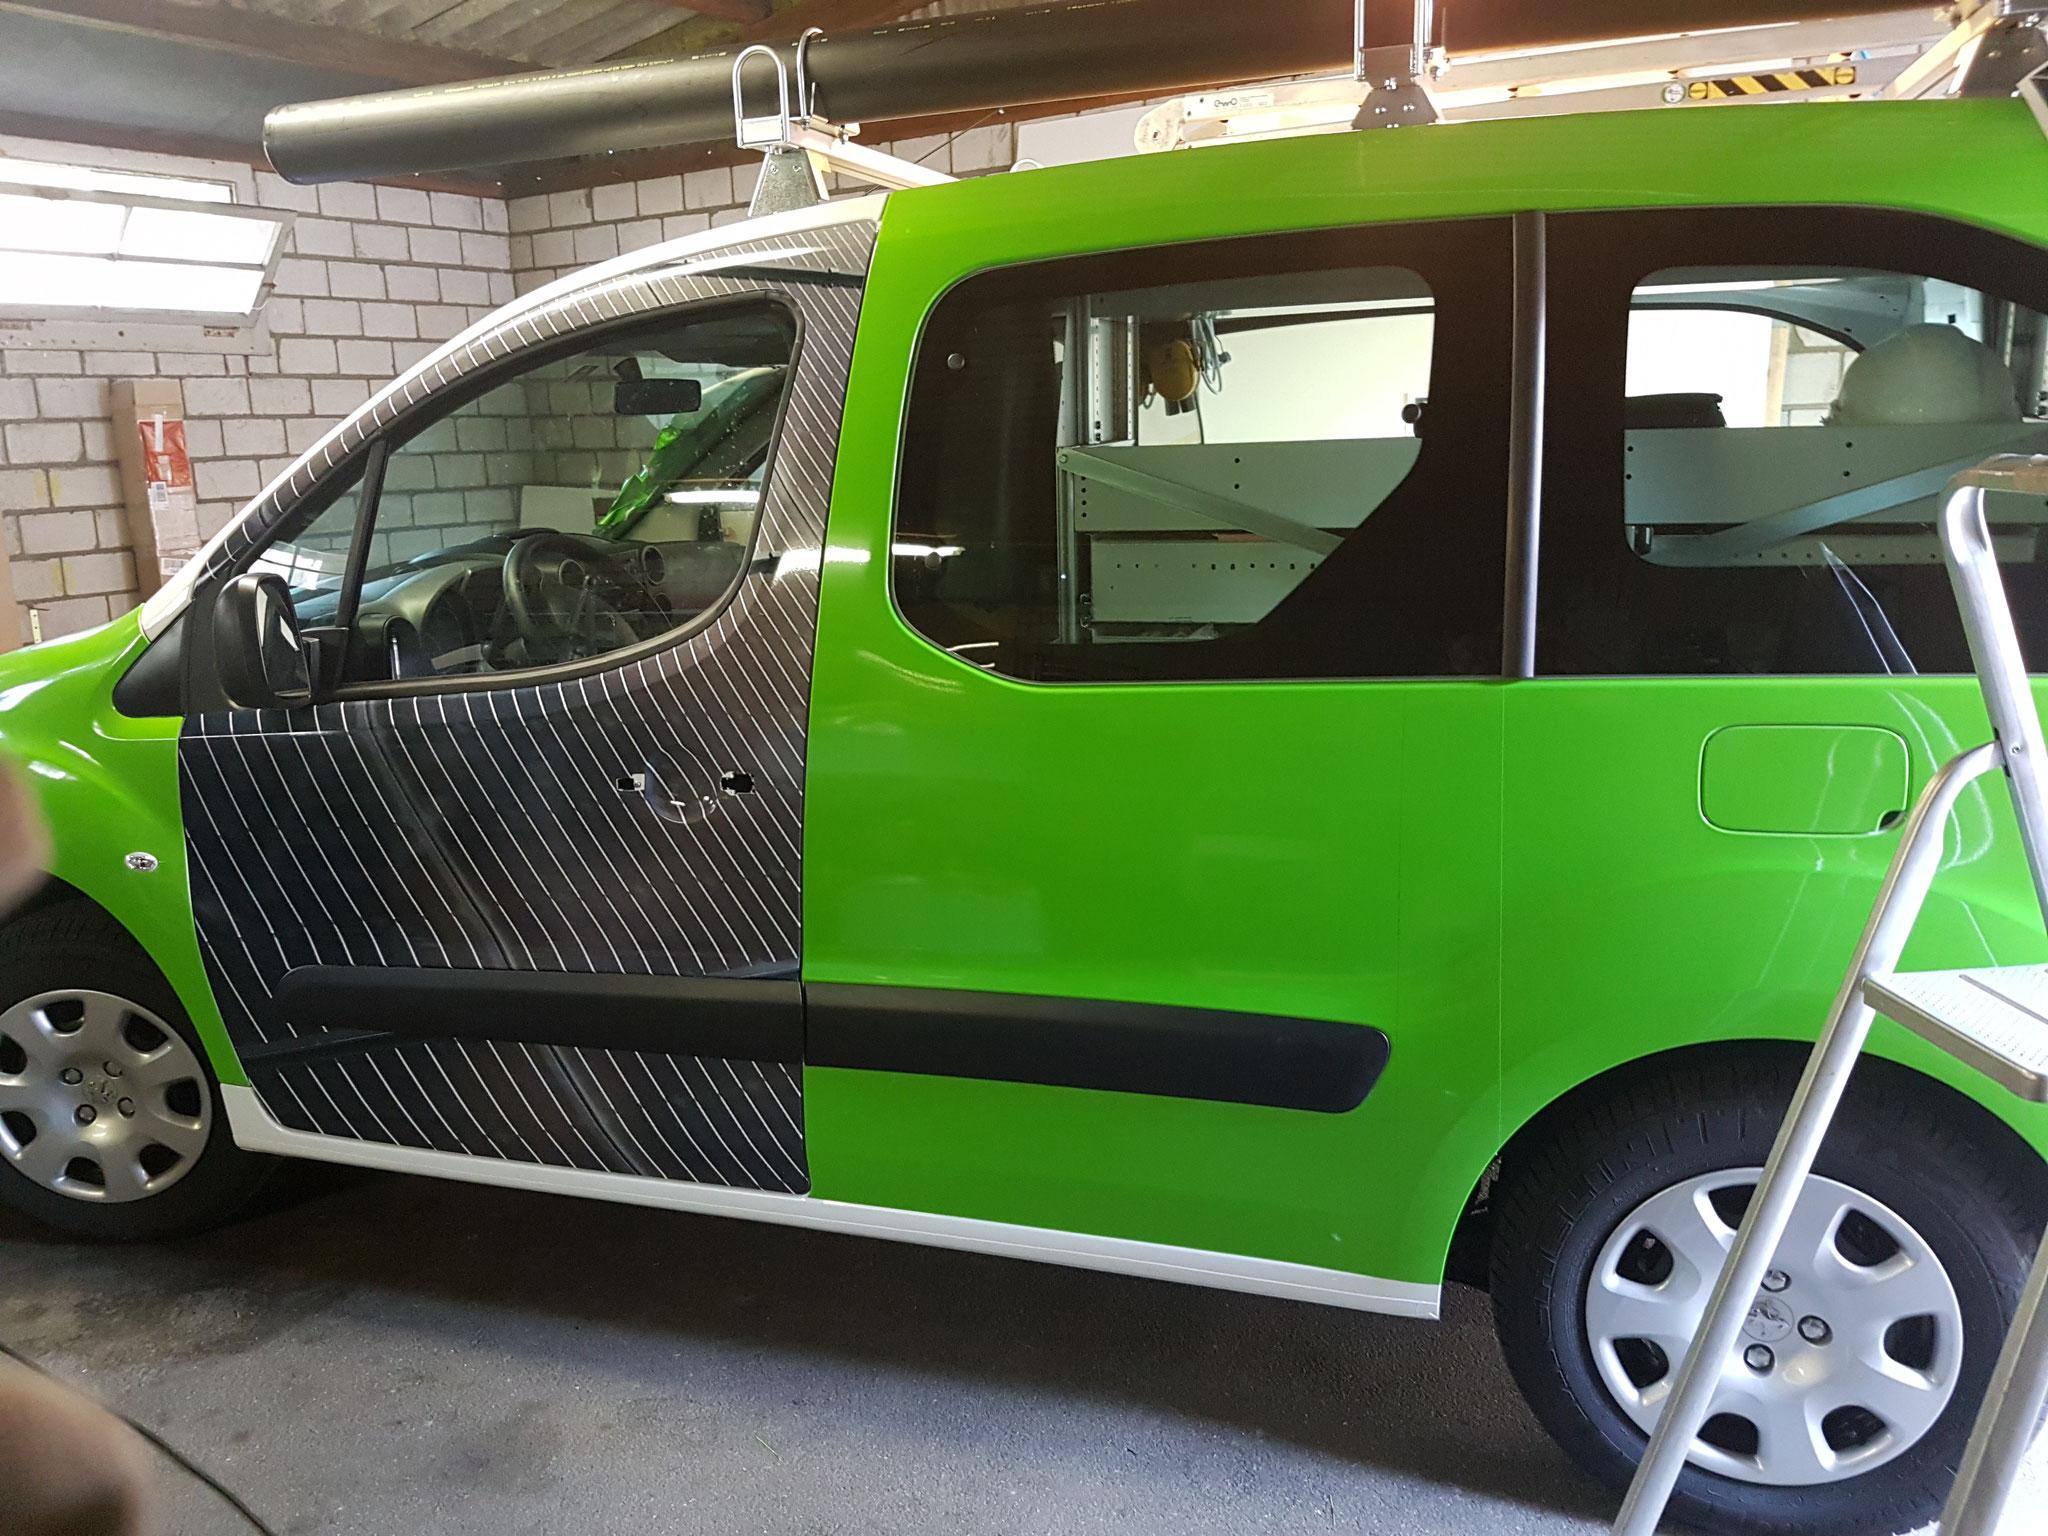 Digitaldruckfolie und grüne PVC Folie (Car-Wrap)